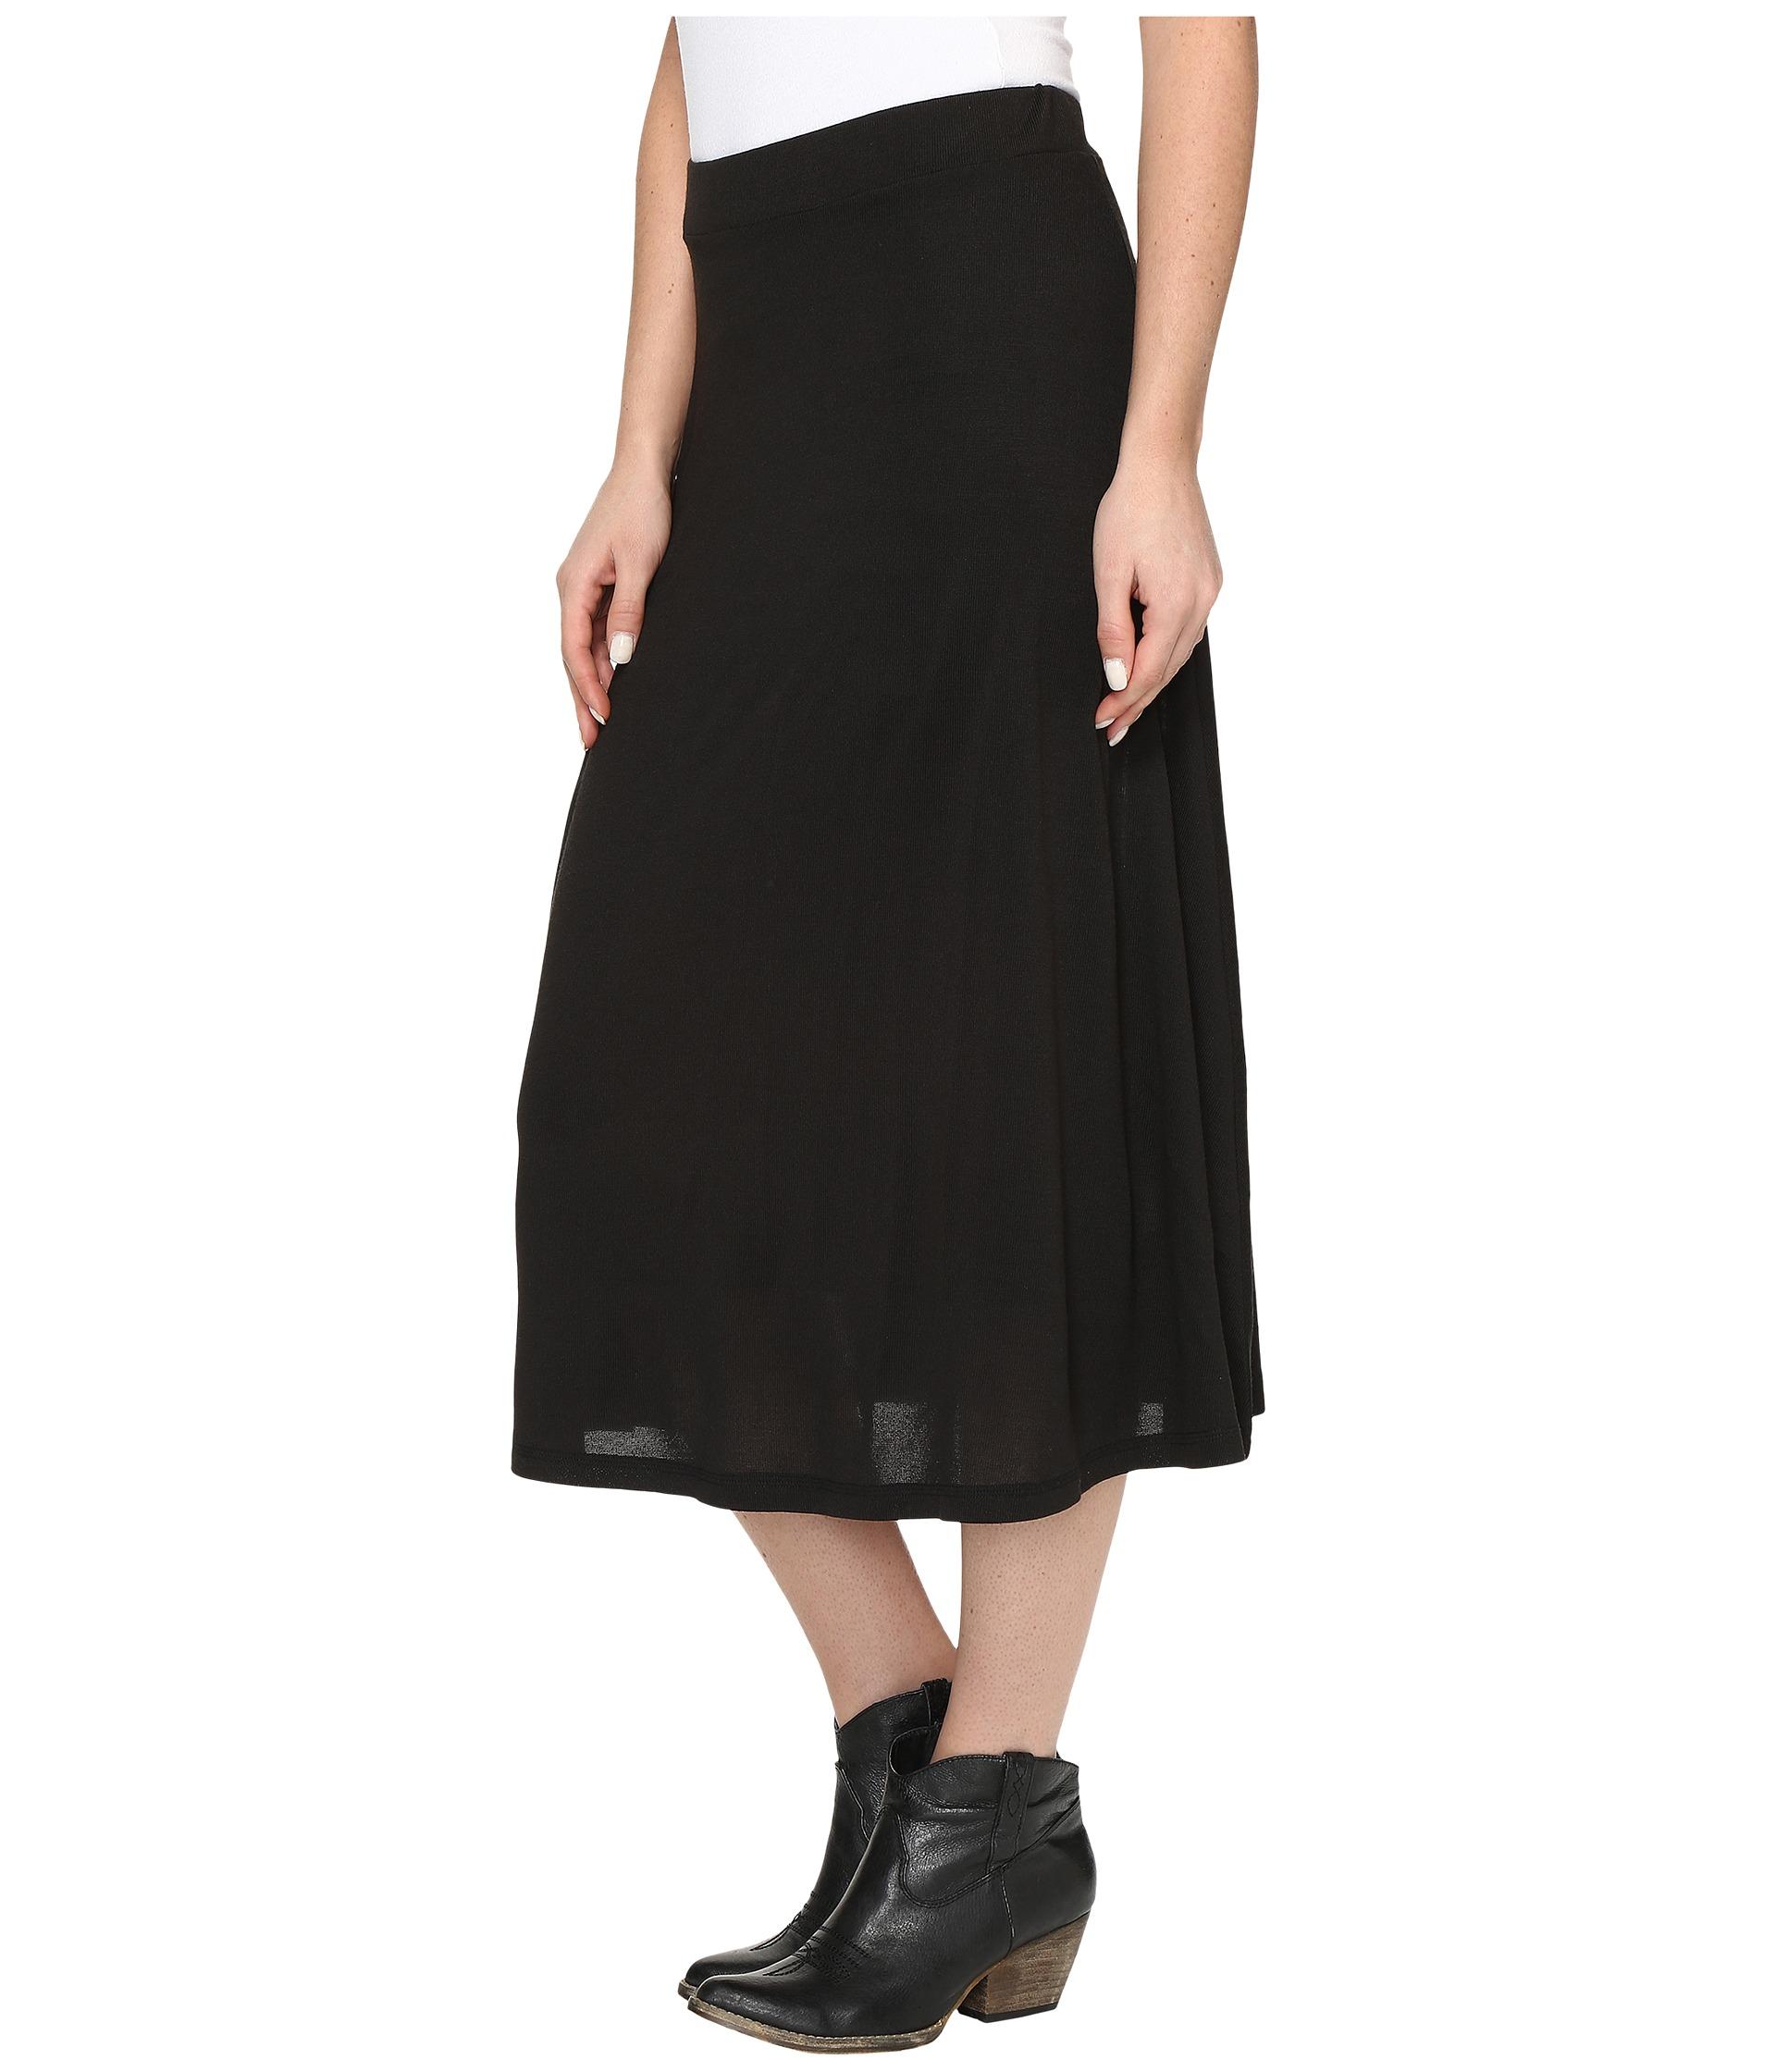 roper 0612 black sweater jersey a line skirt black